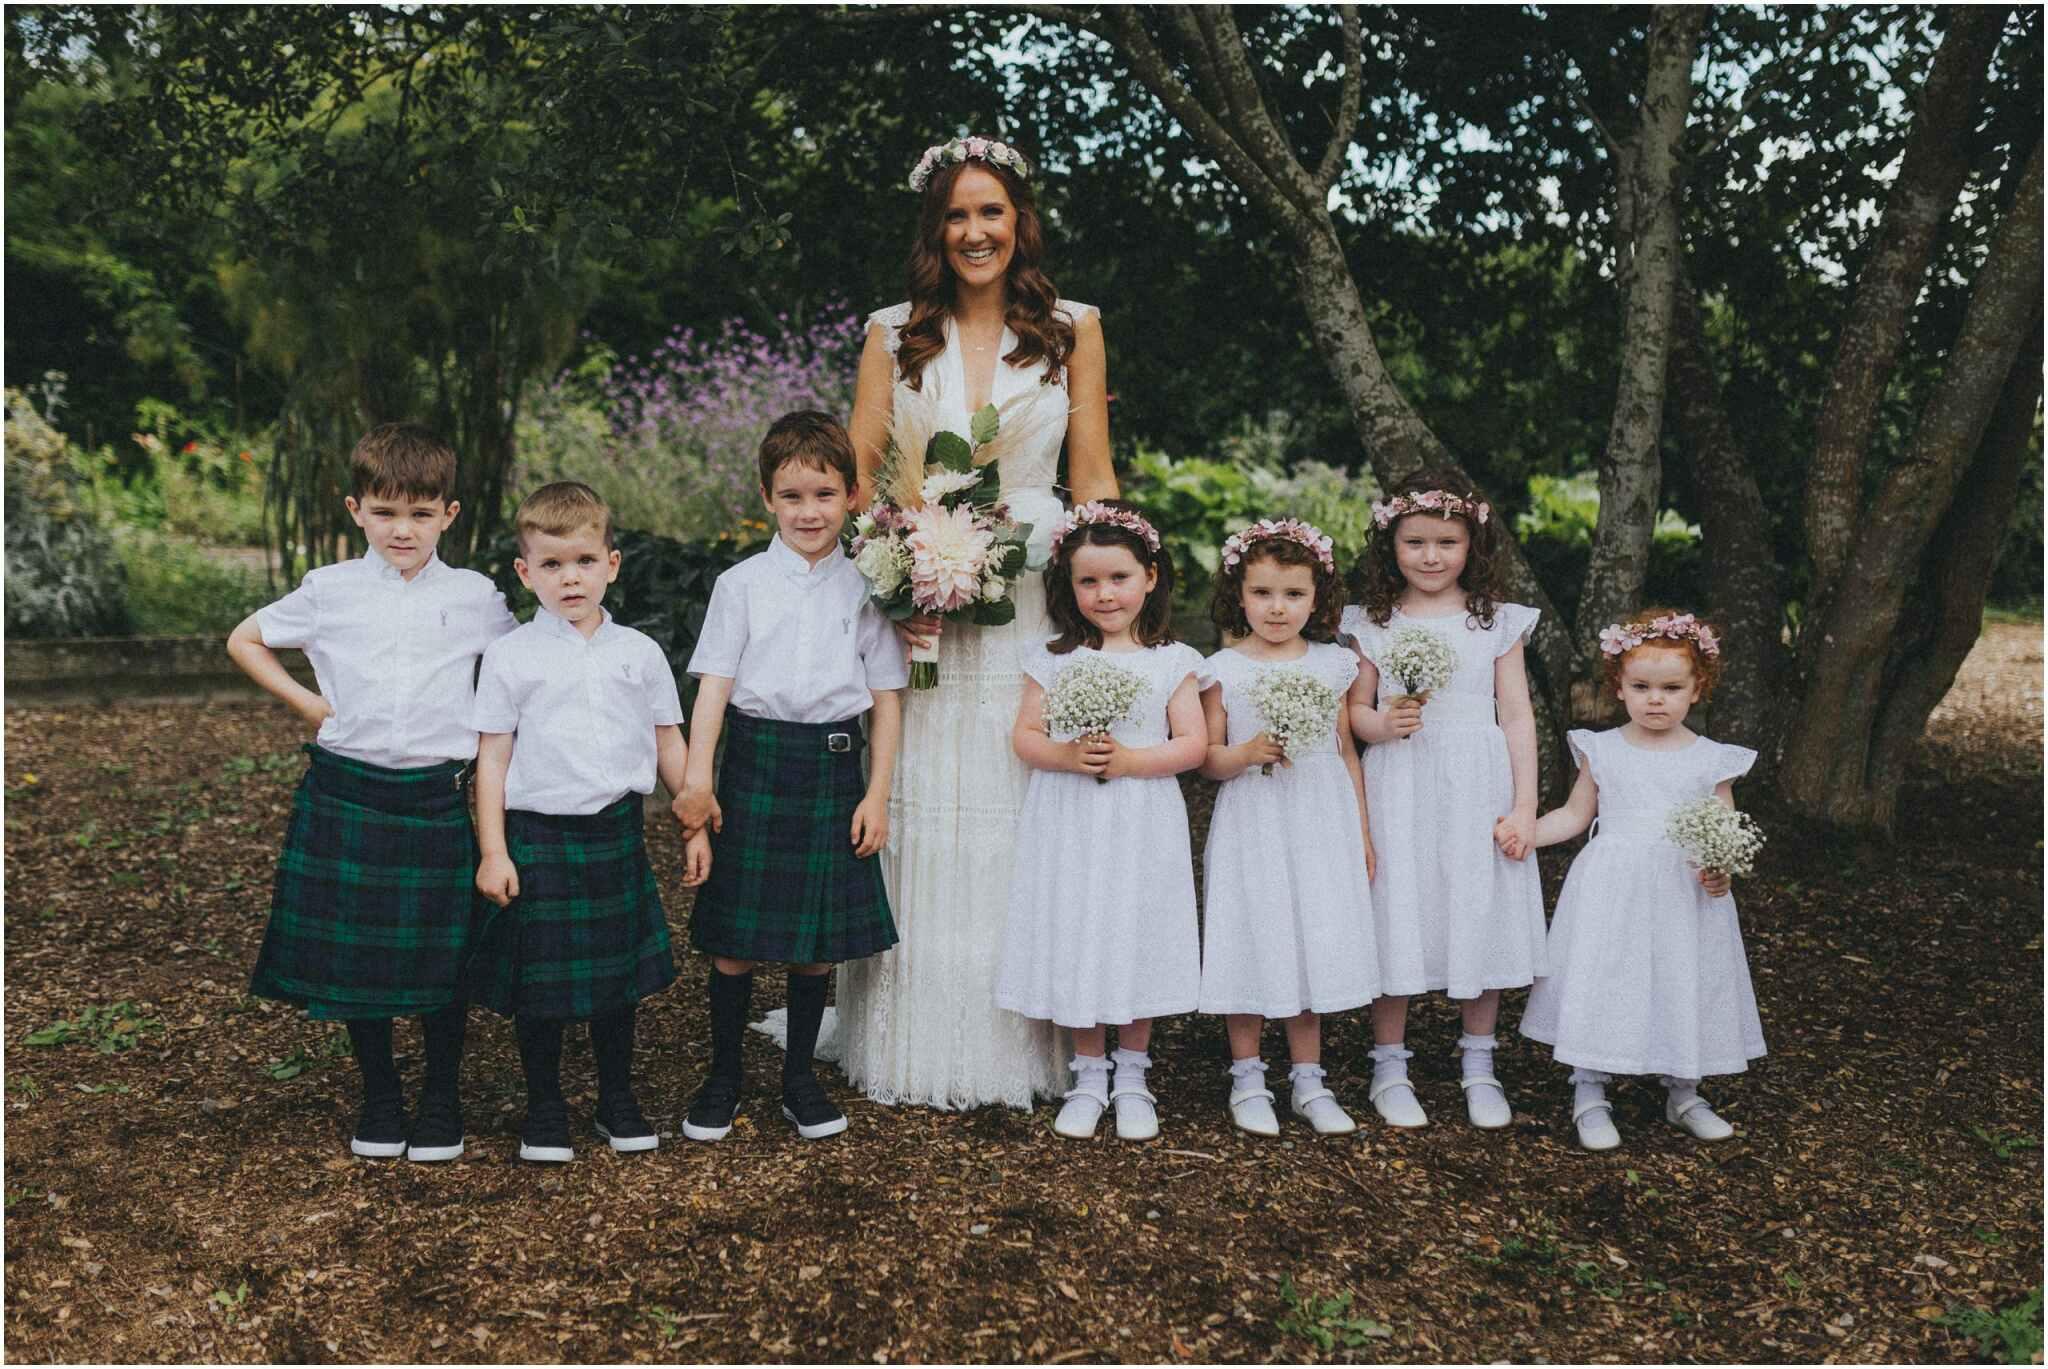 Fionnuala + Paul - Mount Druid Alternative Wedding 63